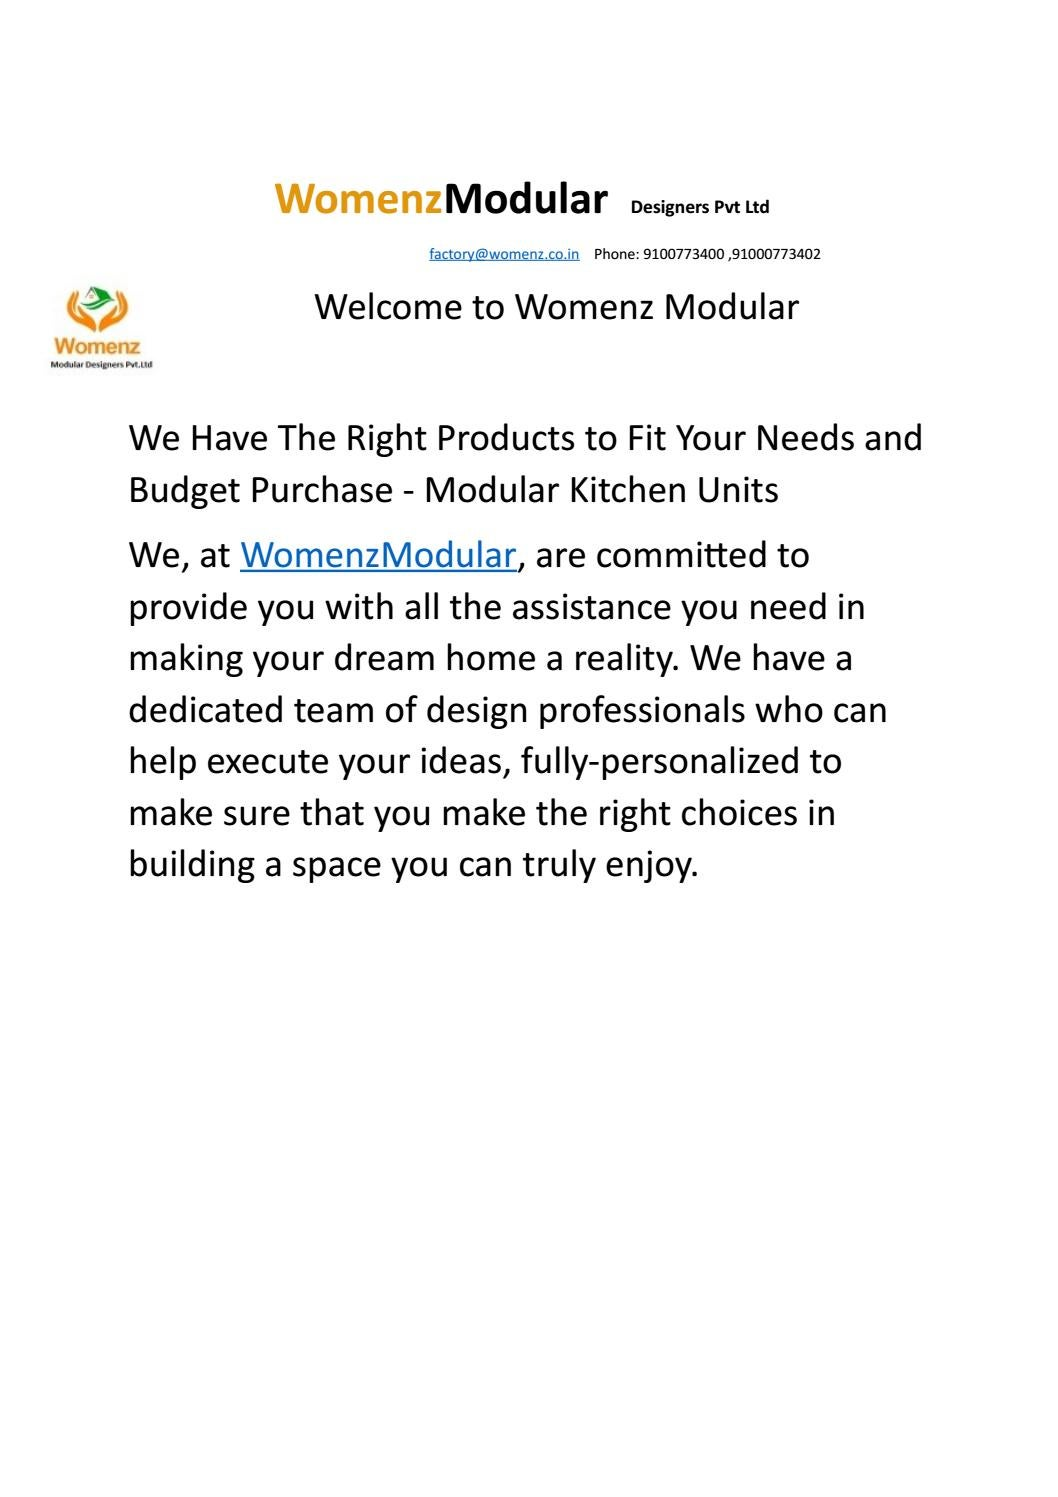 Womenz Modular Designers Pvt Ltd Kukatpally By Womenz Modular Designers Issuu